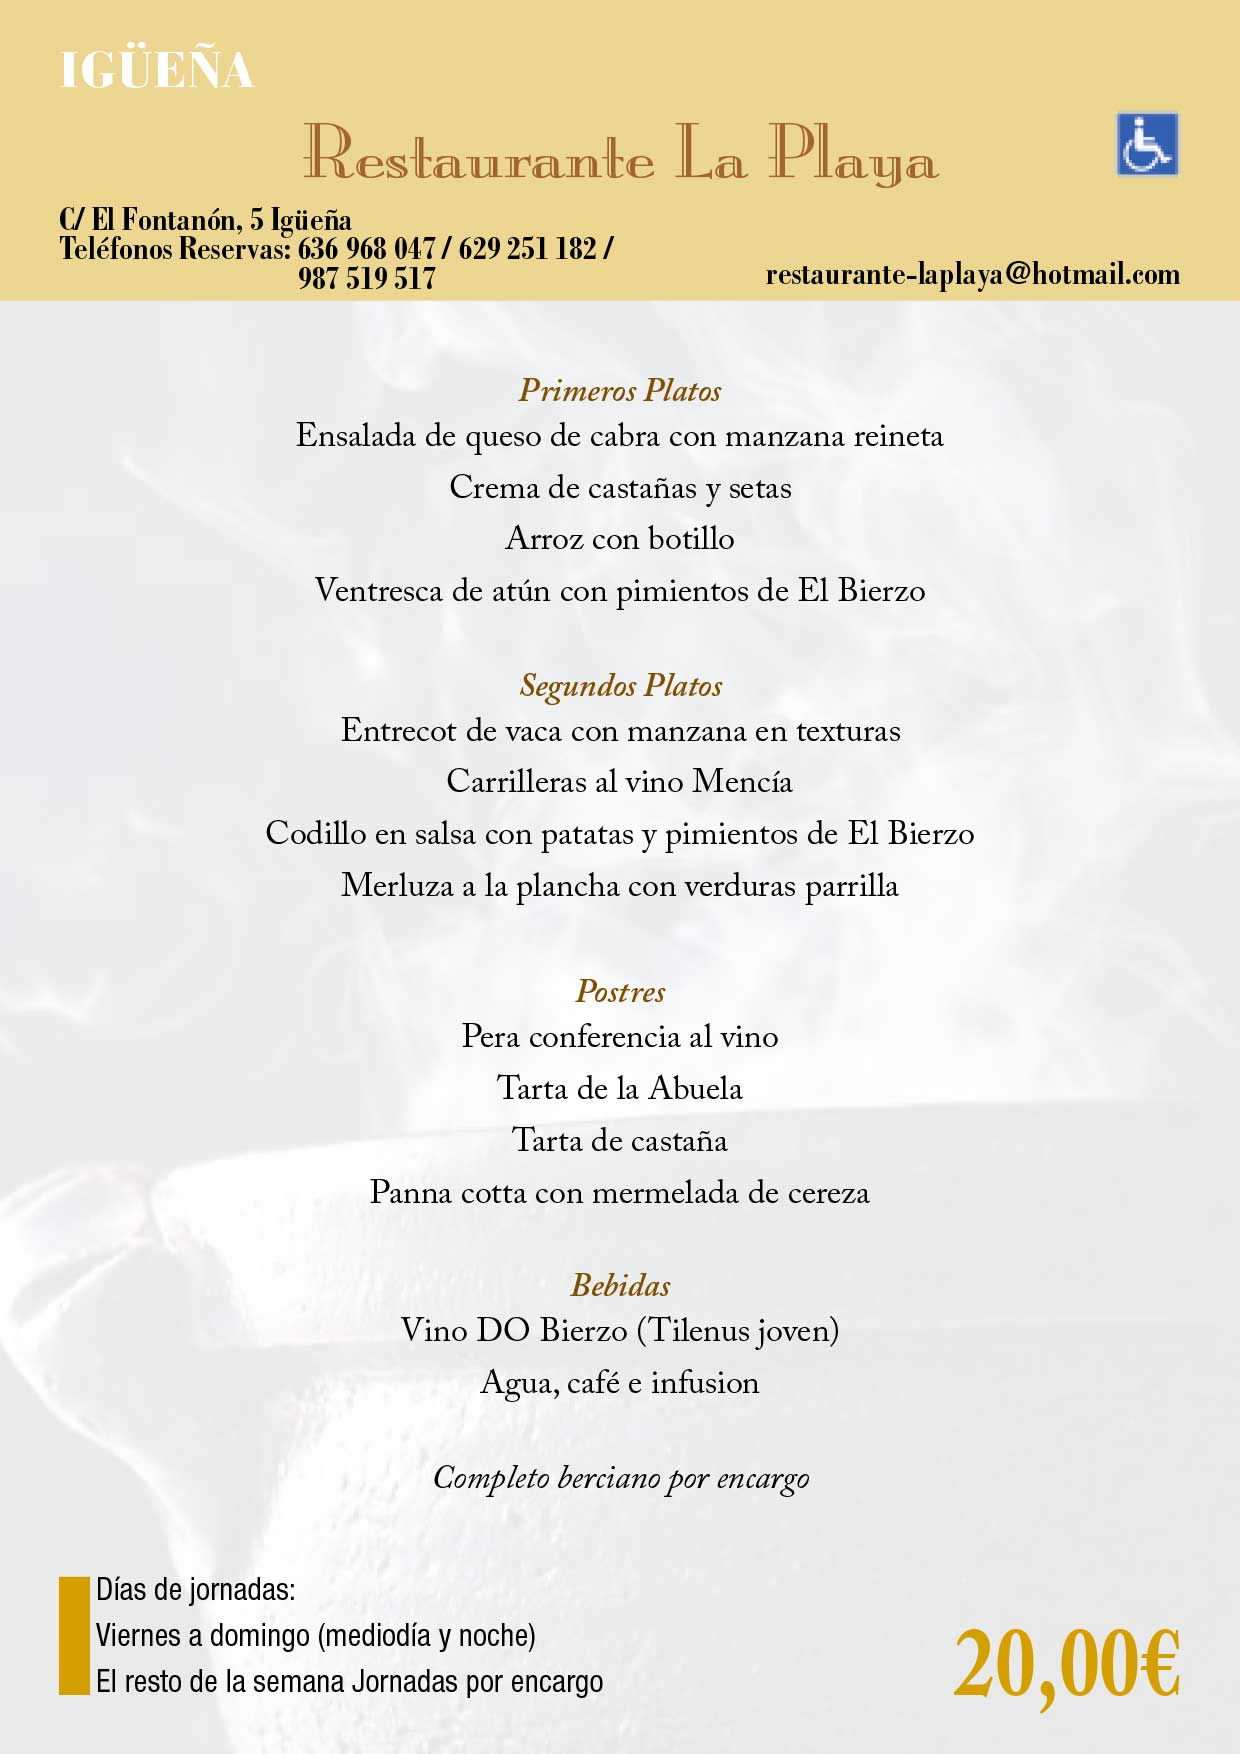 XXXIII Jornadas gastronómicas del Bierzo 2017. Restaurantes participantes 10